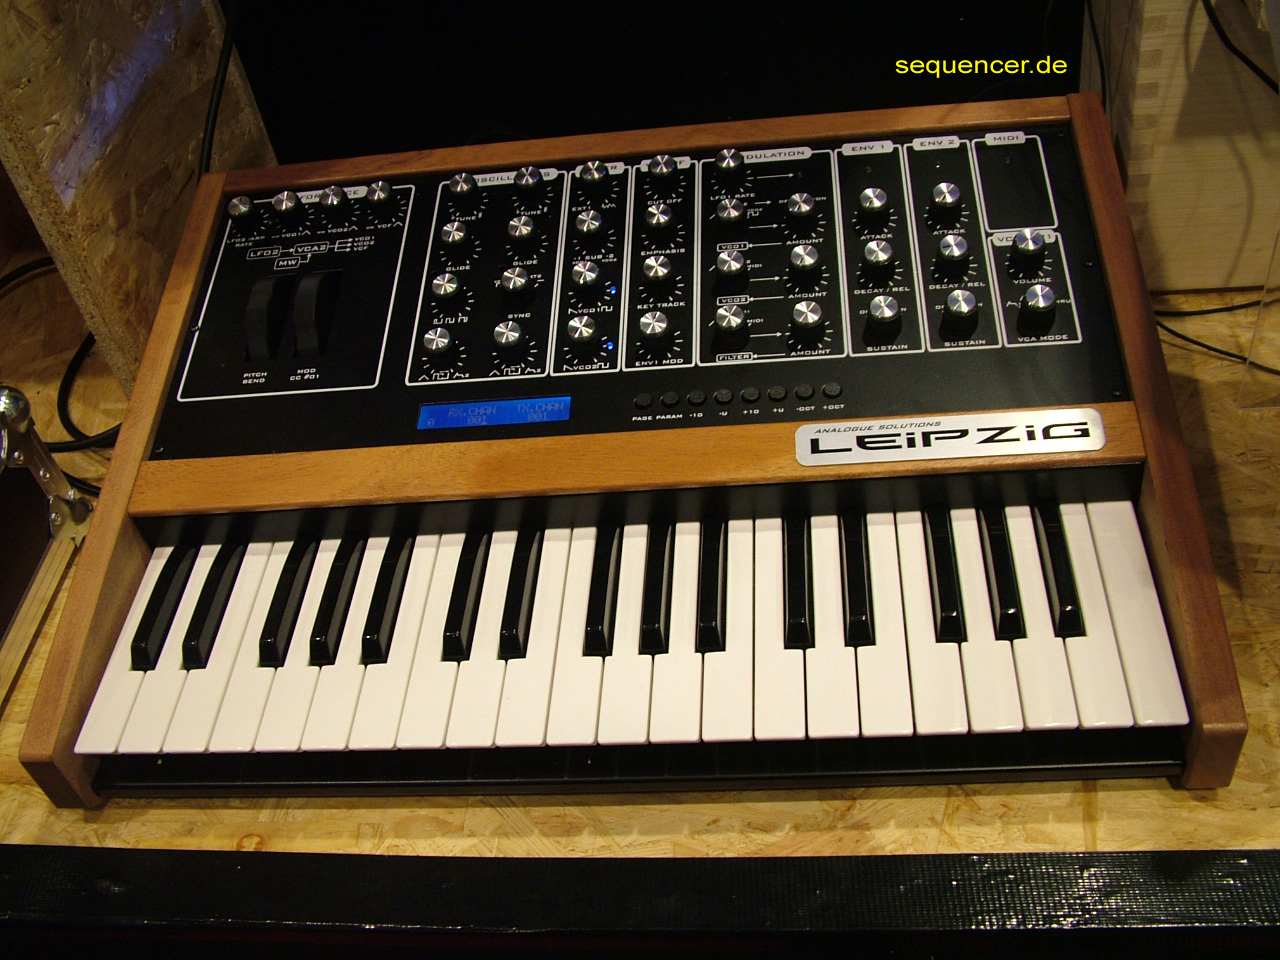 Leipzig K Synthesizer Leipzig K Synthesizer synthesizer